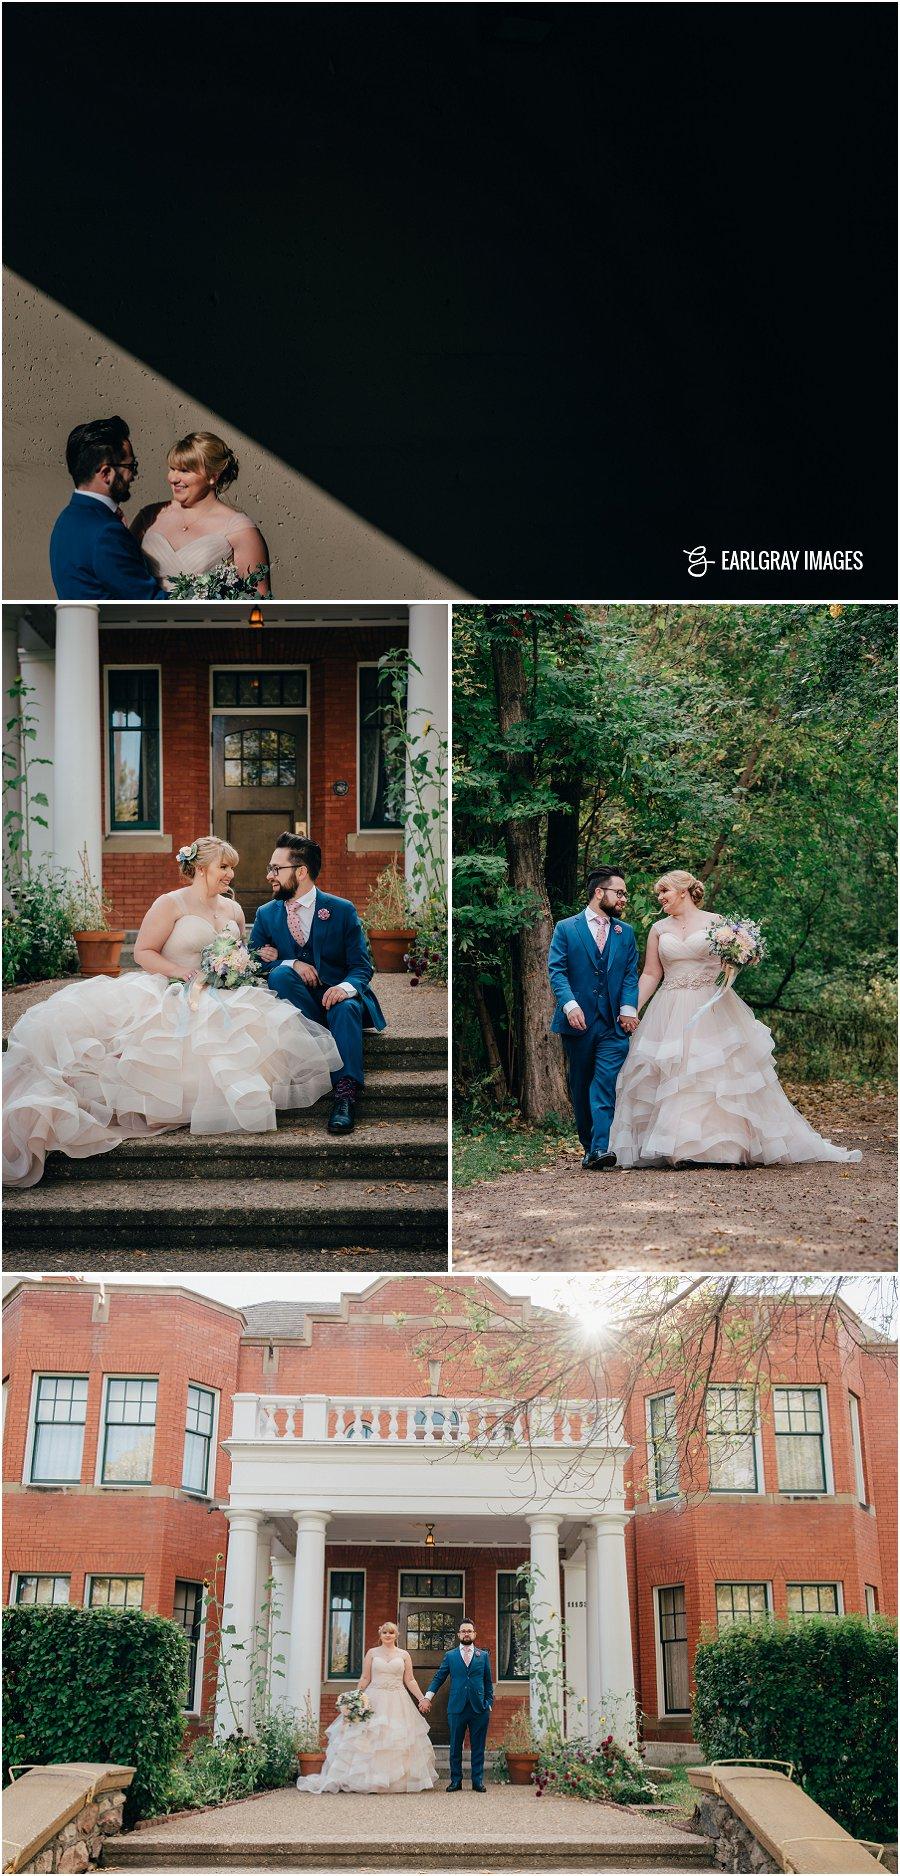 Rutherford House wedding, University of Alberta fall wedding, Faculty club wedding, Edmonton fall wedding, convocation hall wedding, princess dress wedding